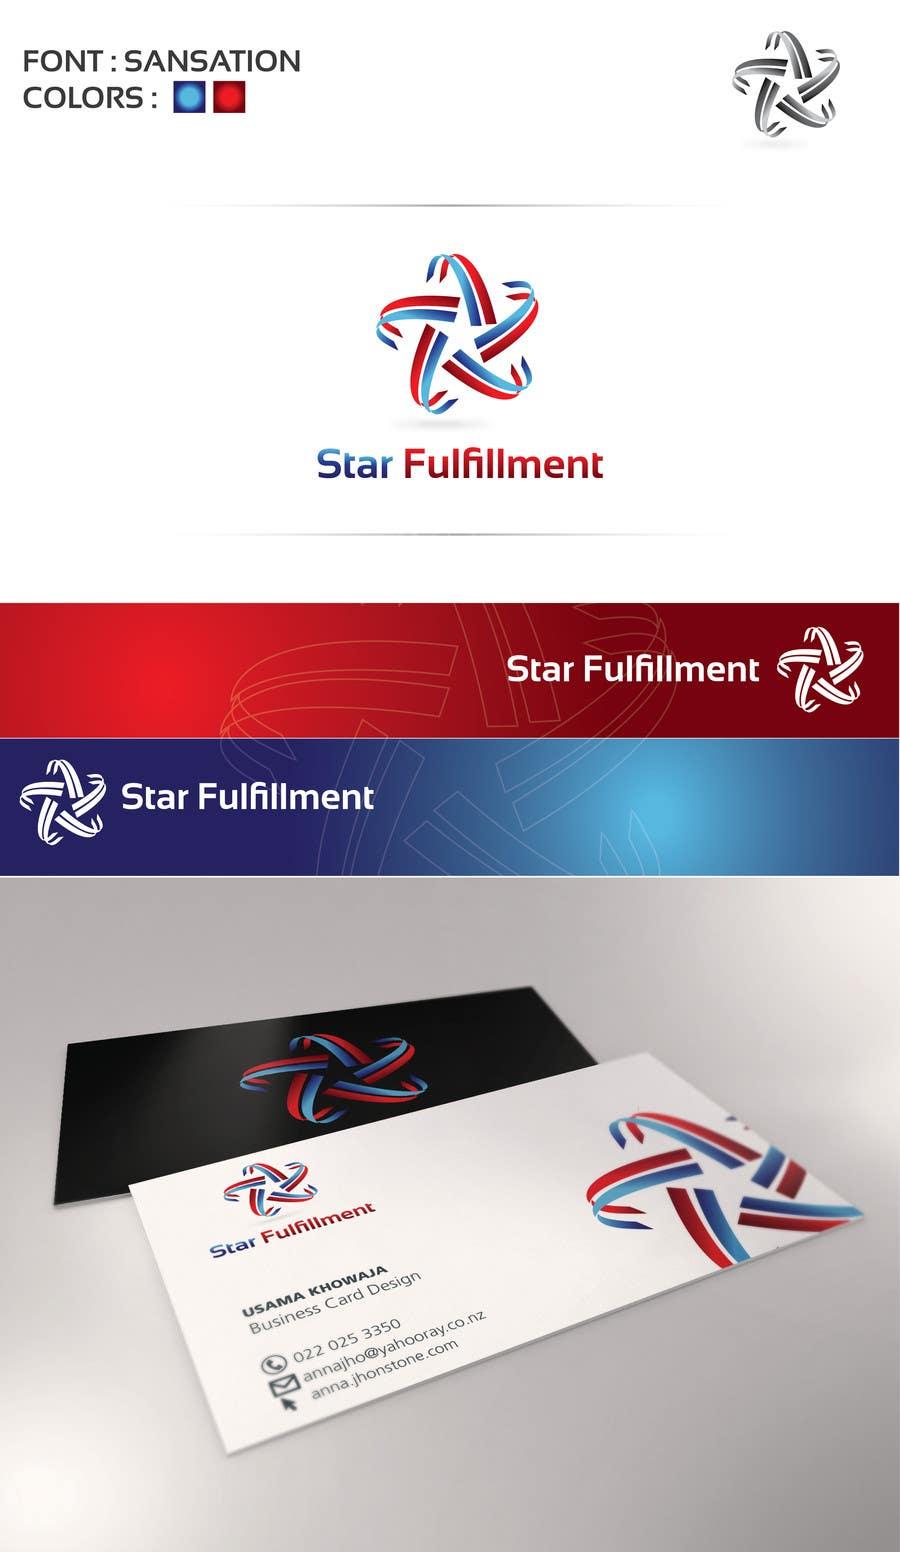 Penyertaan Peraduan #64 untuk Design a Logo for Star Fulfillment